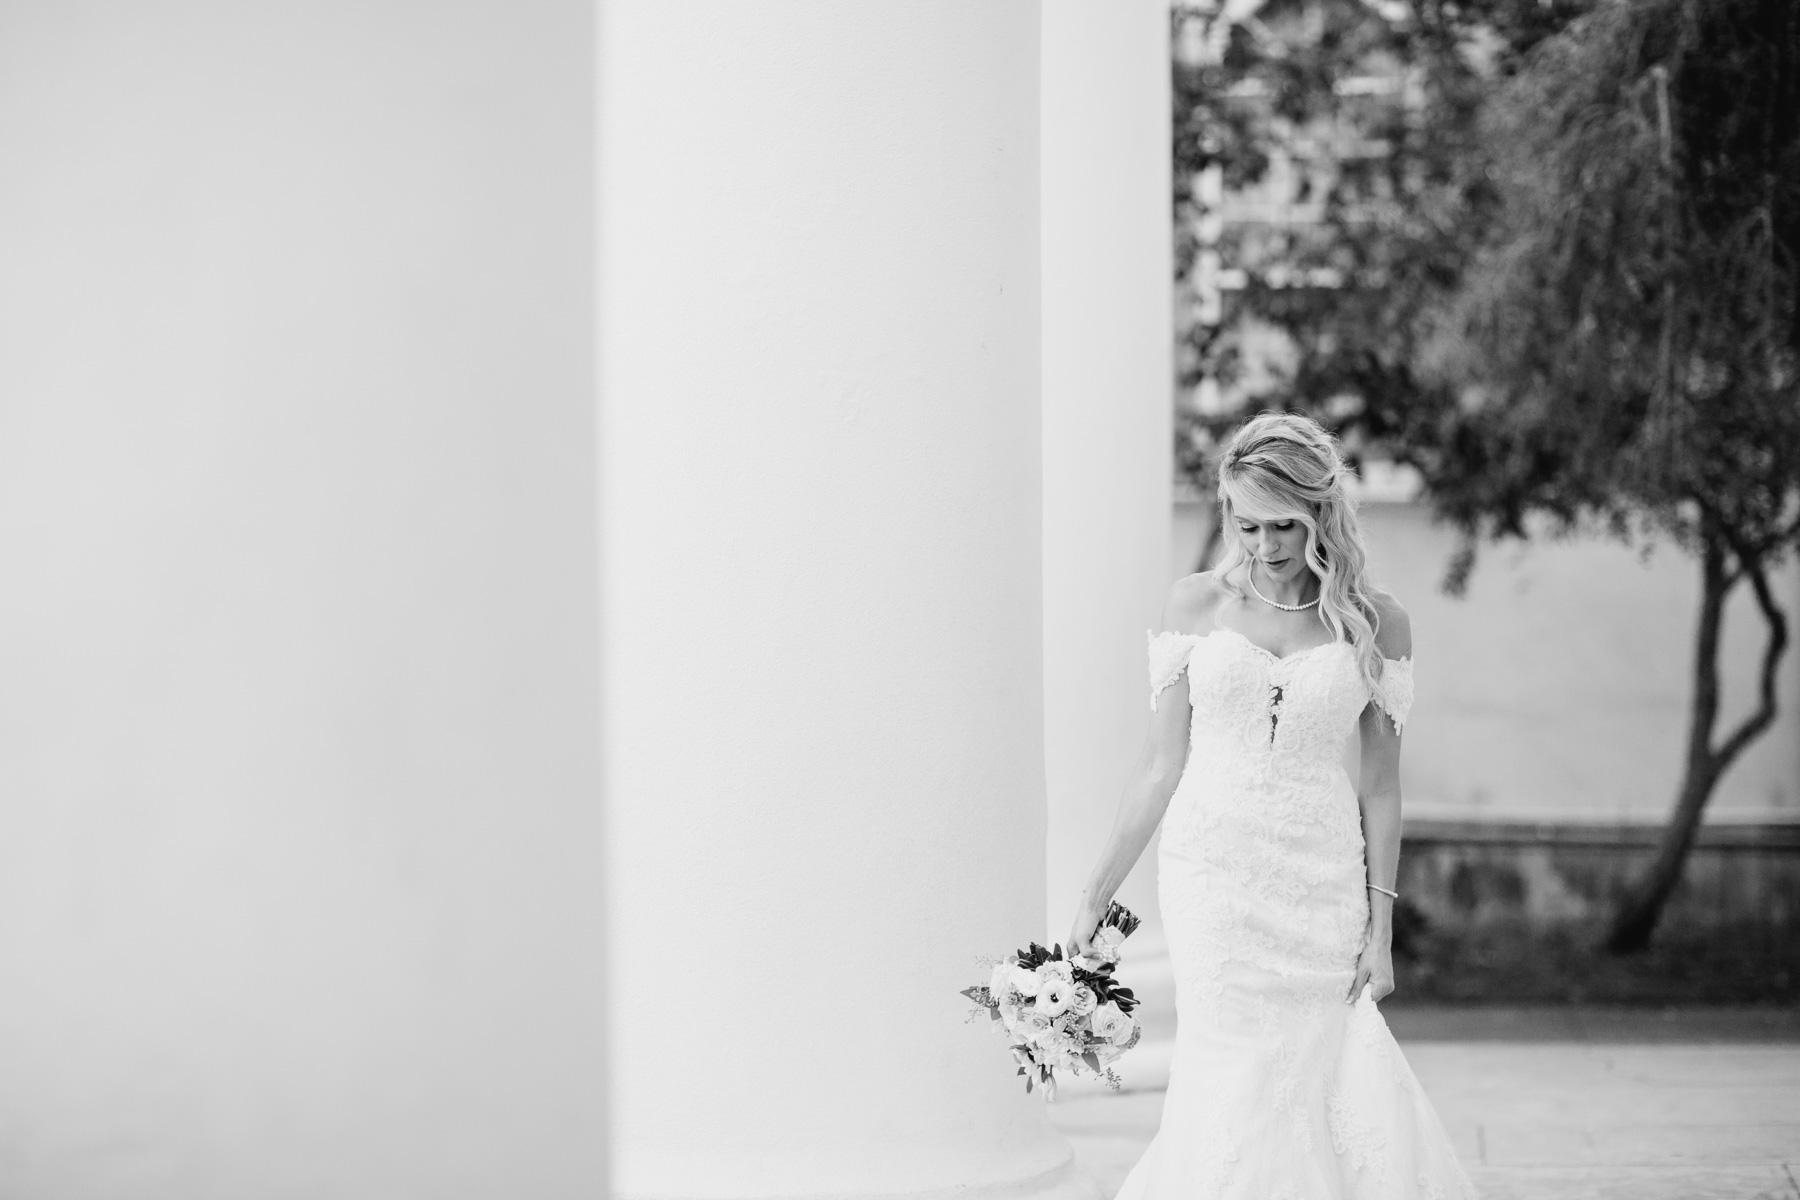 Charleston-best-wedding-photographer-SC-23.jpg